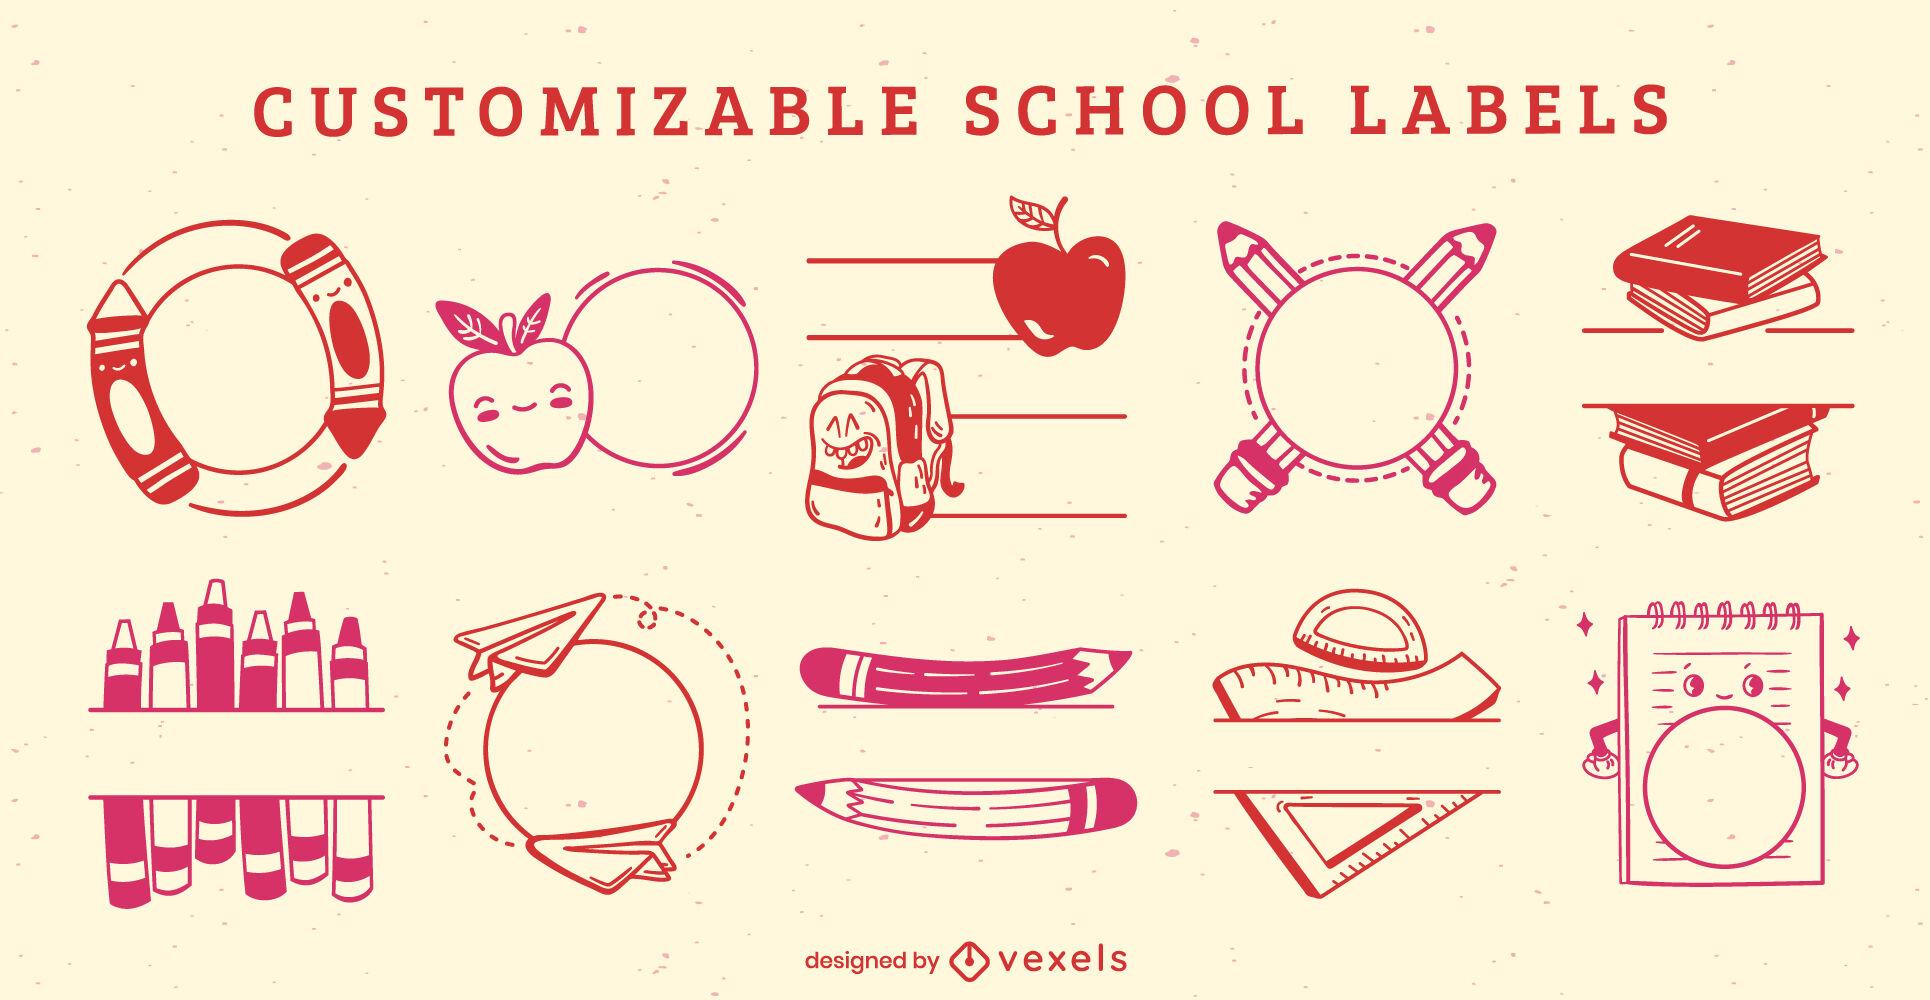 Elementos de etiqueta escolar personalizables